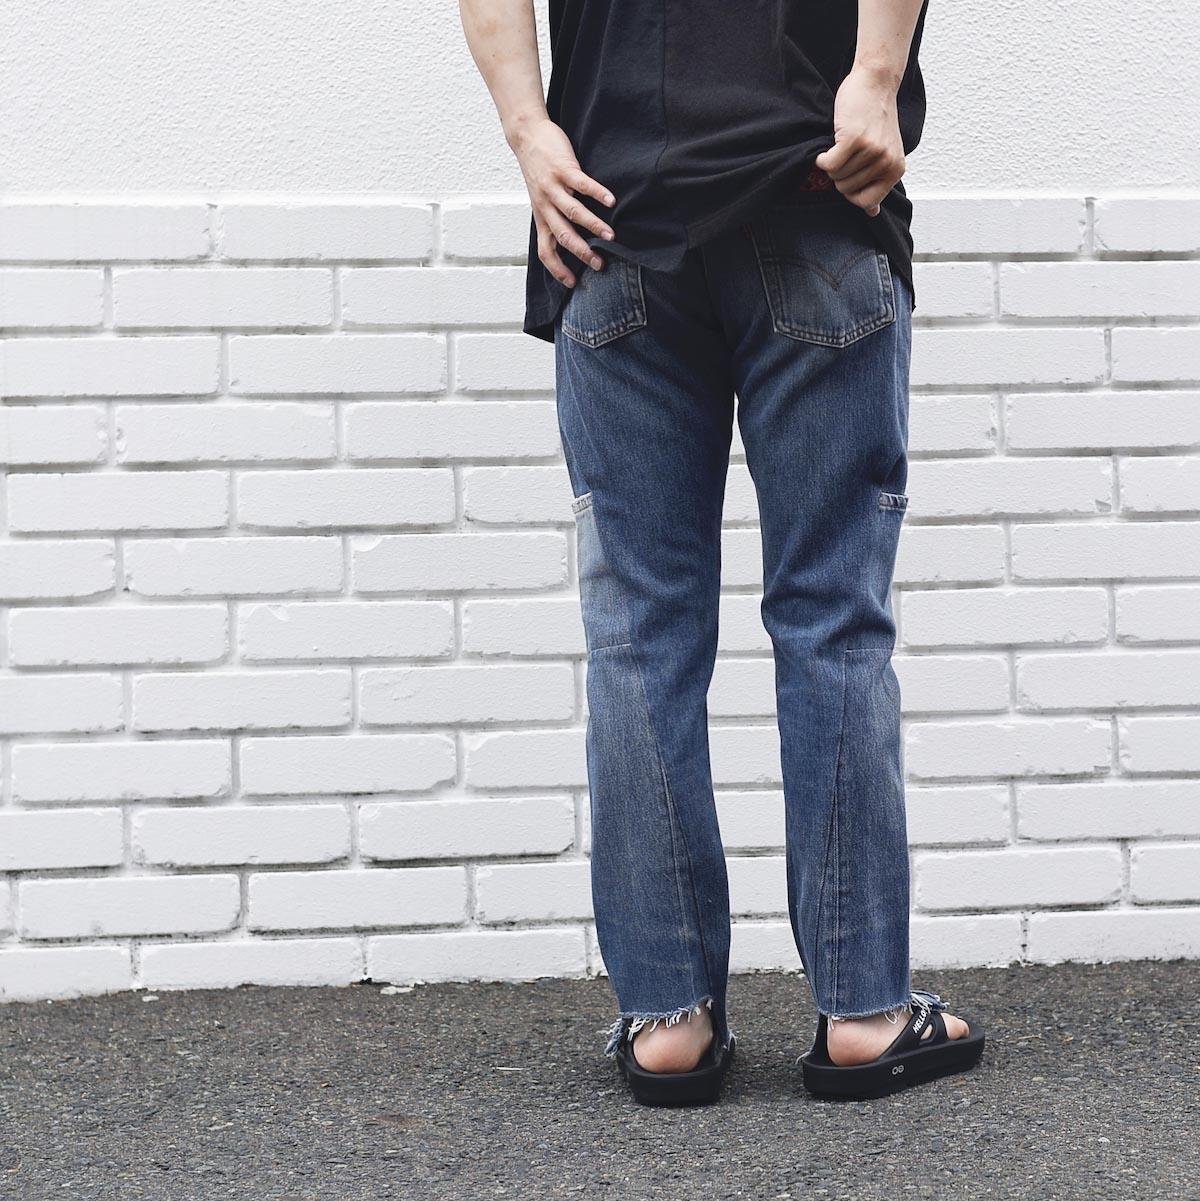 OLD PARK / 7Pocket Jeans -Blue着用例② (162cm / Ssize着用)